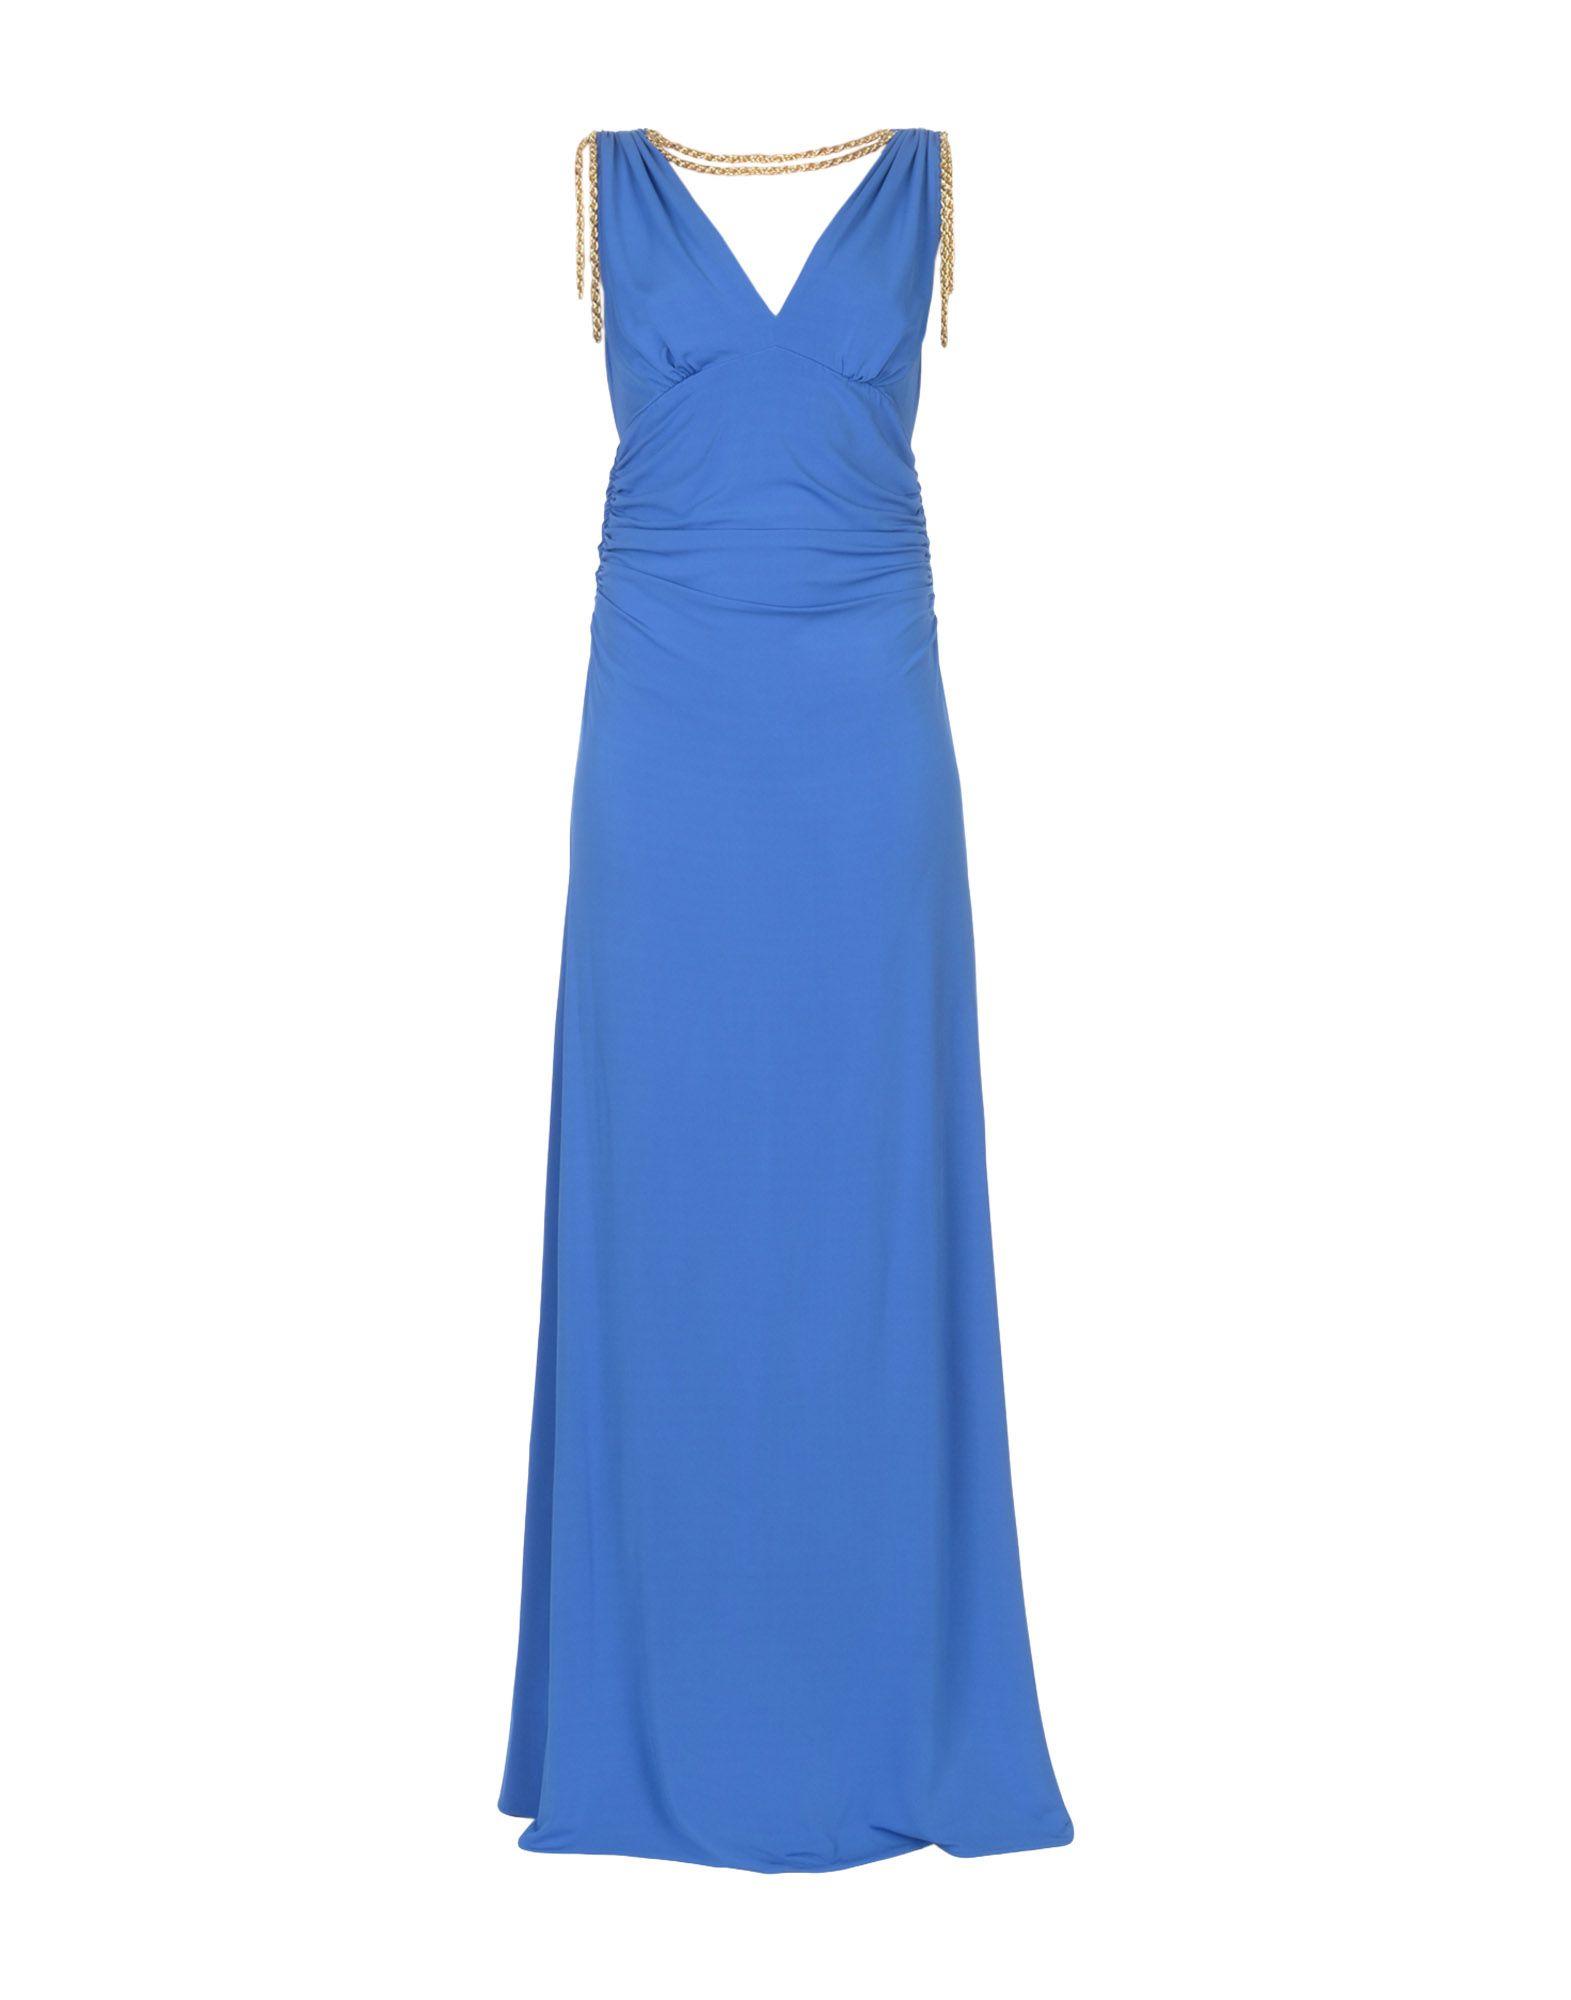 Vestito Lungo Space Style Concept Donna - Acquista online su BRmwP9wRTM